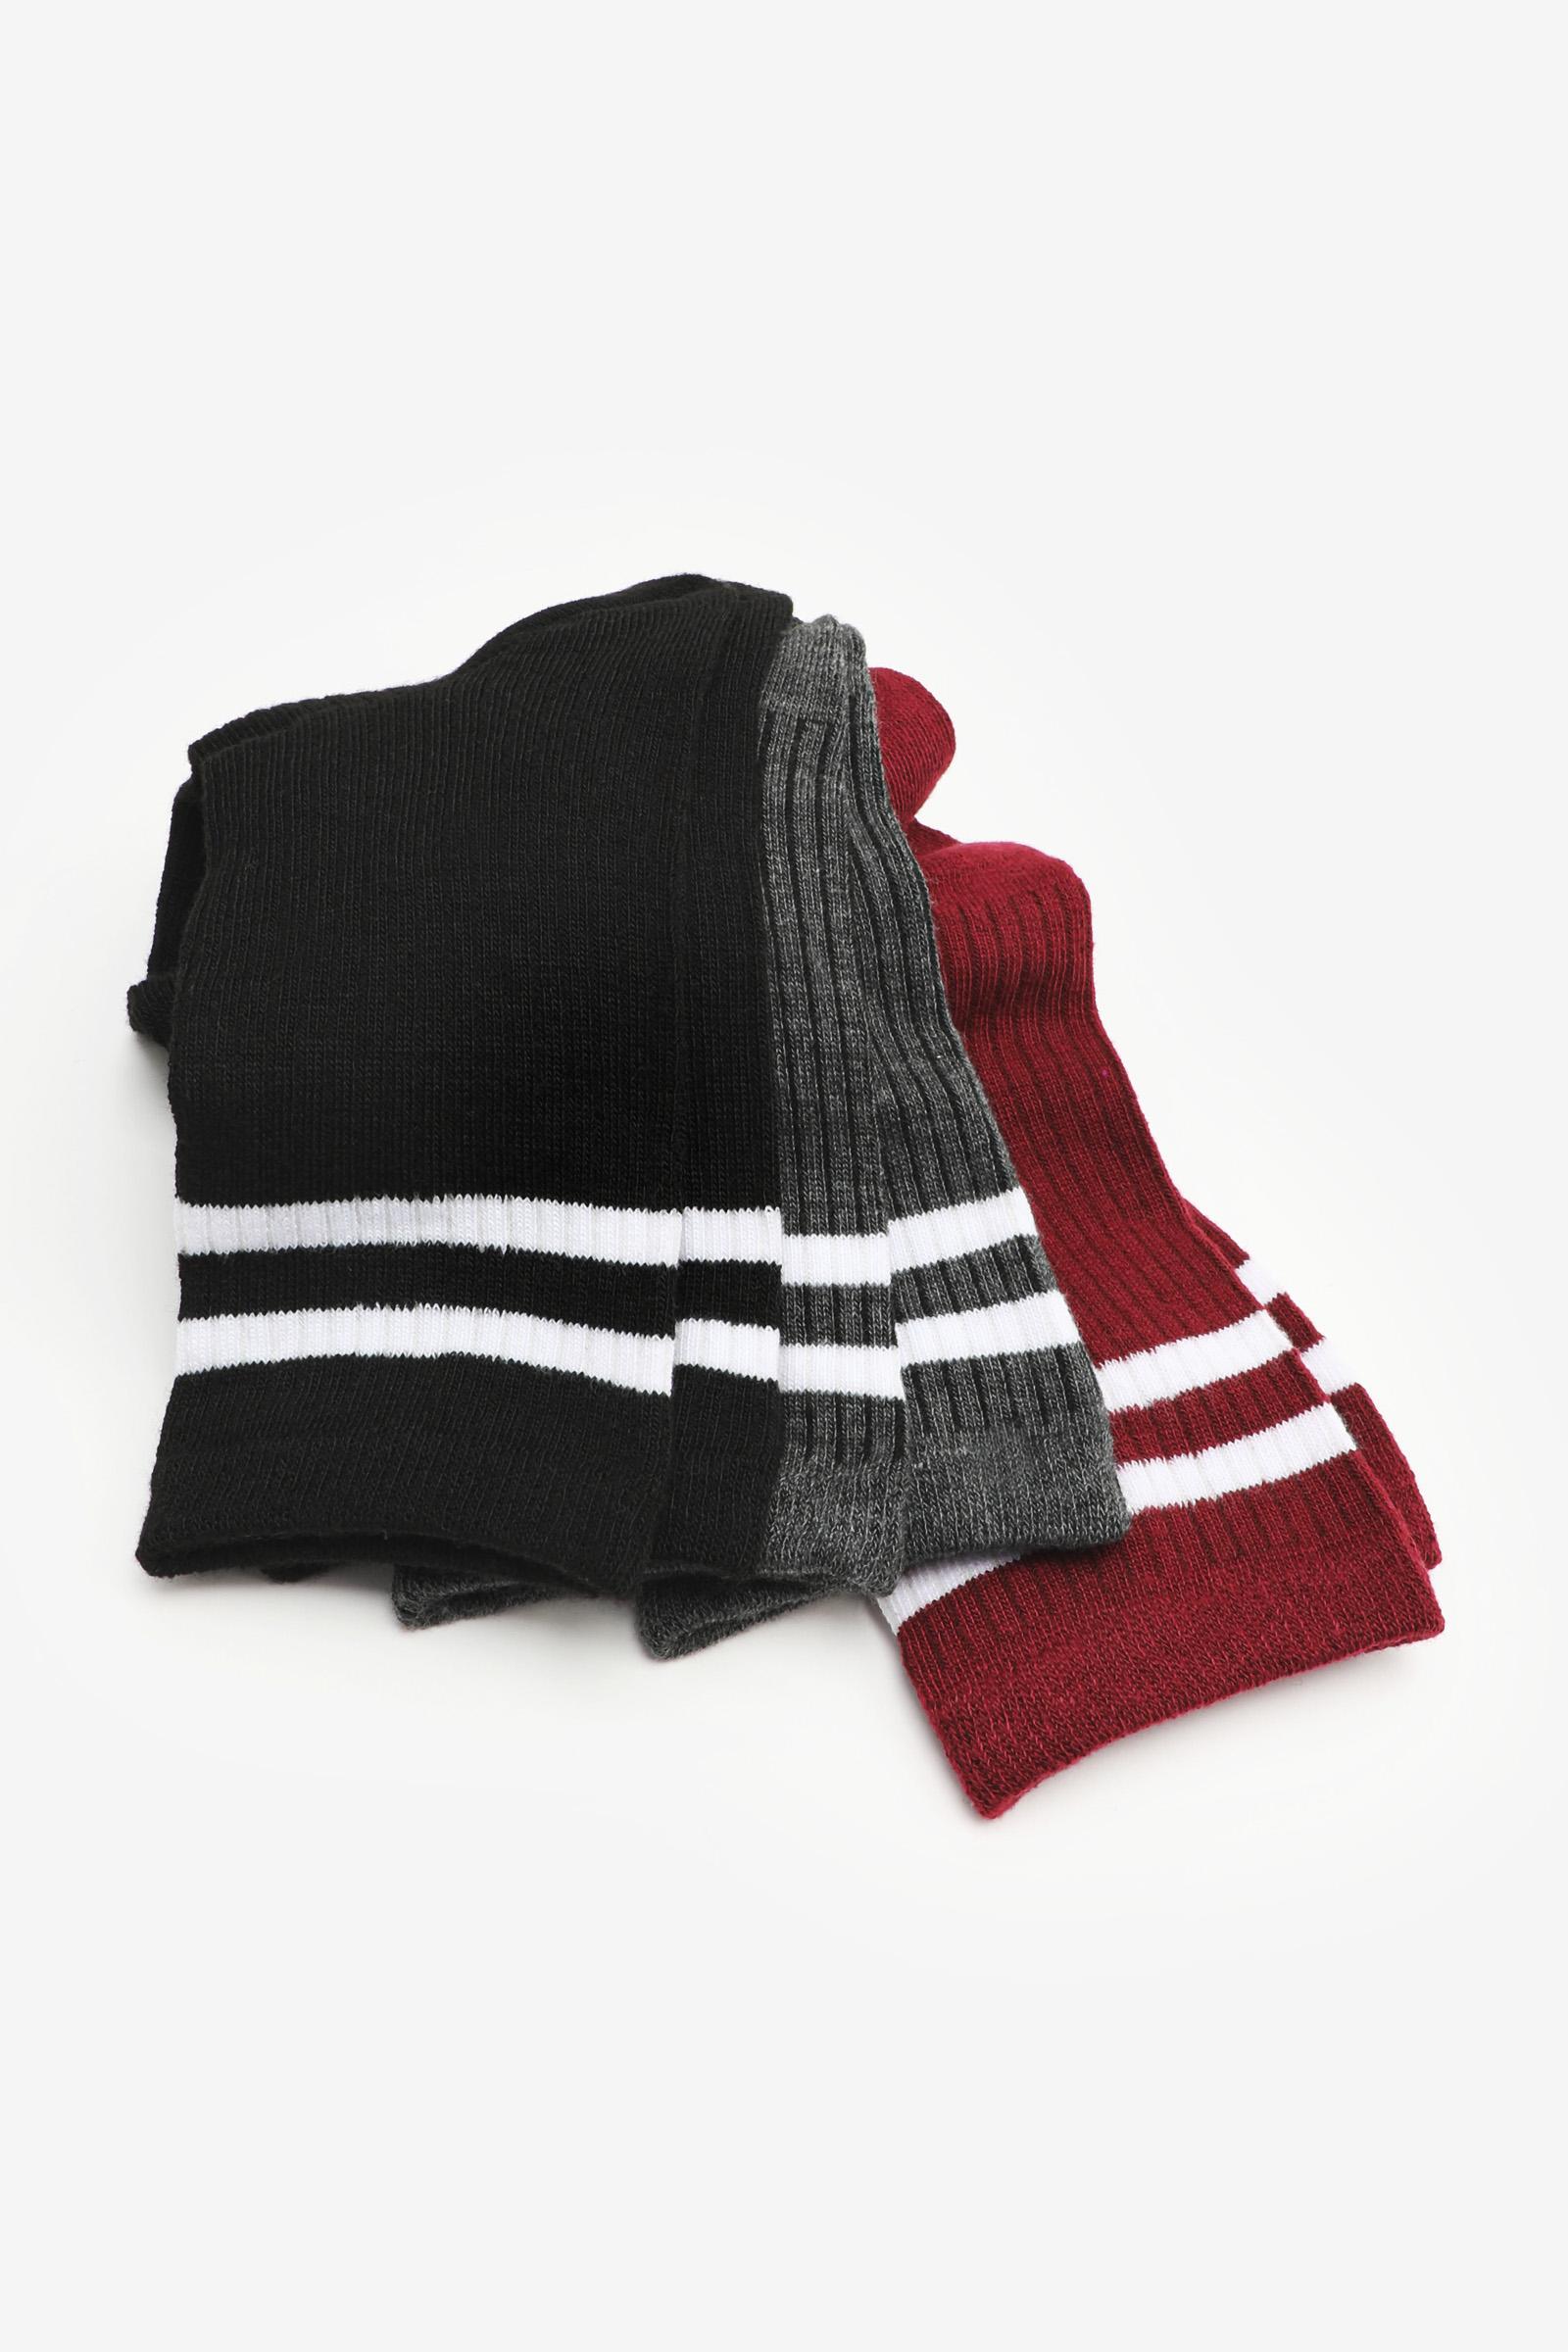 Pack of Striped Crew Socks